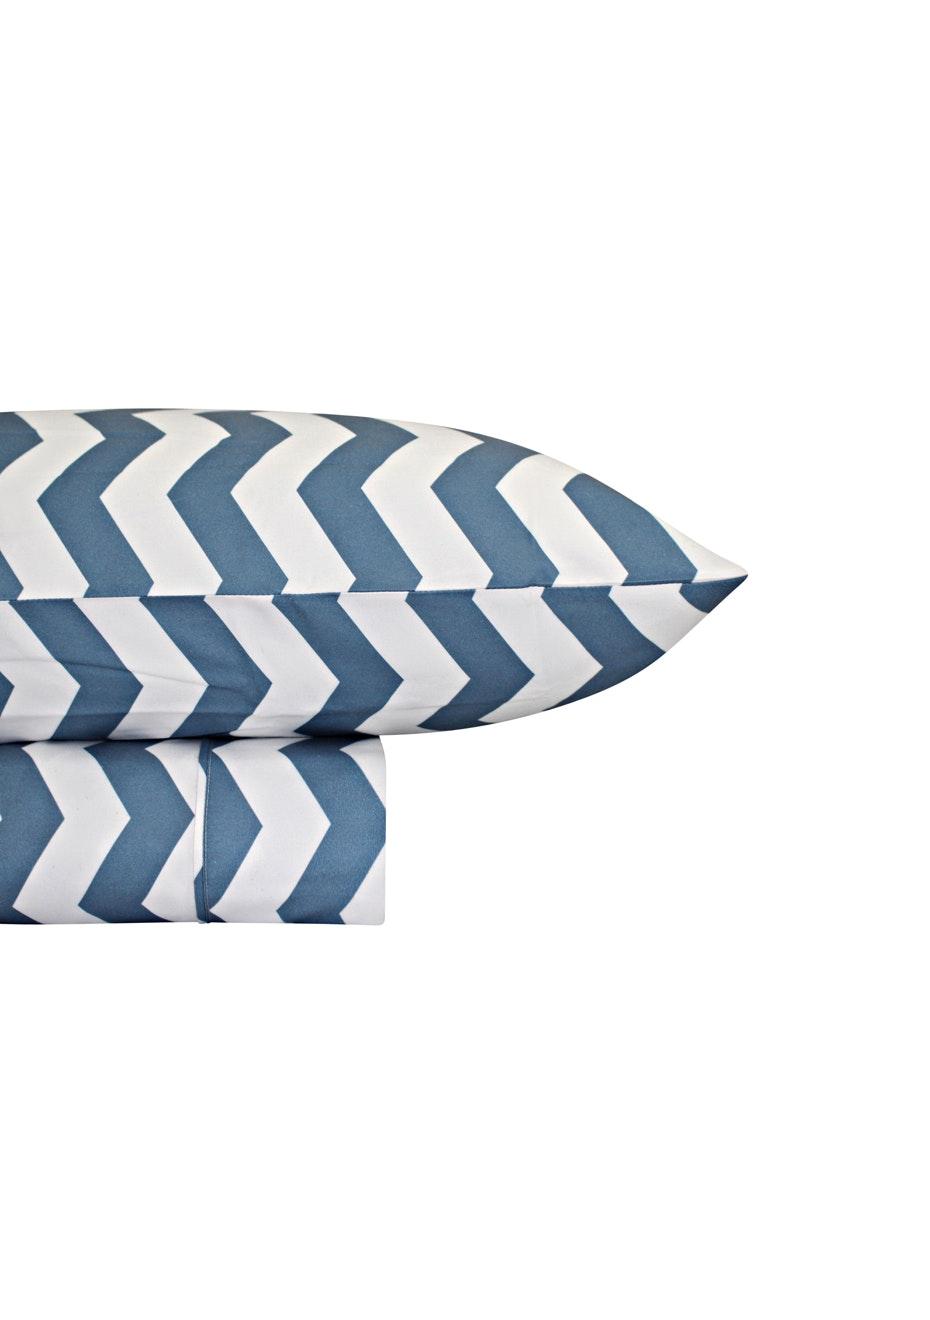 Thermal Flannel Sheet Sets - Chevron Design - Bay Blue - King Bed